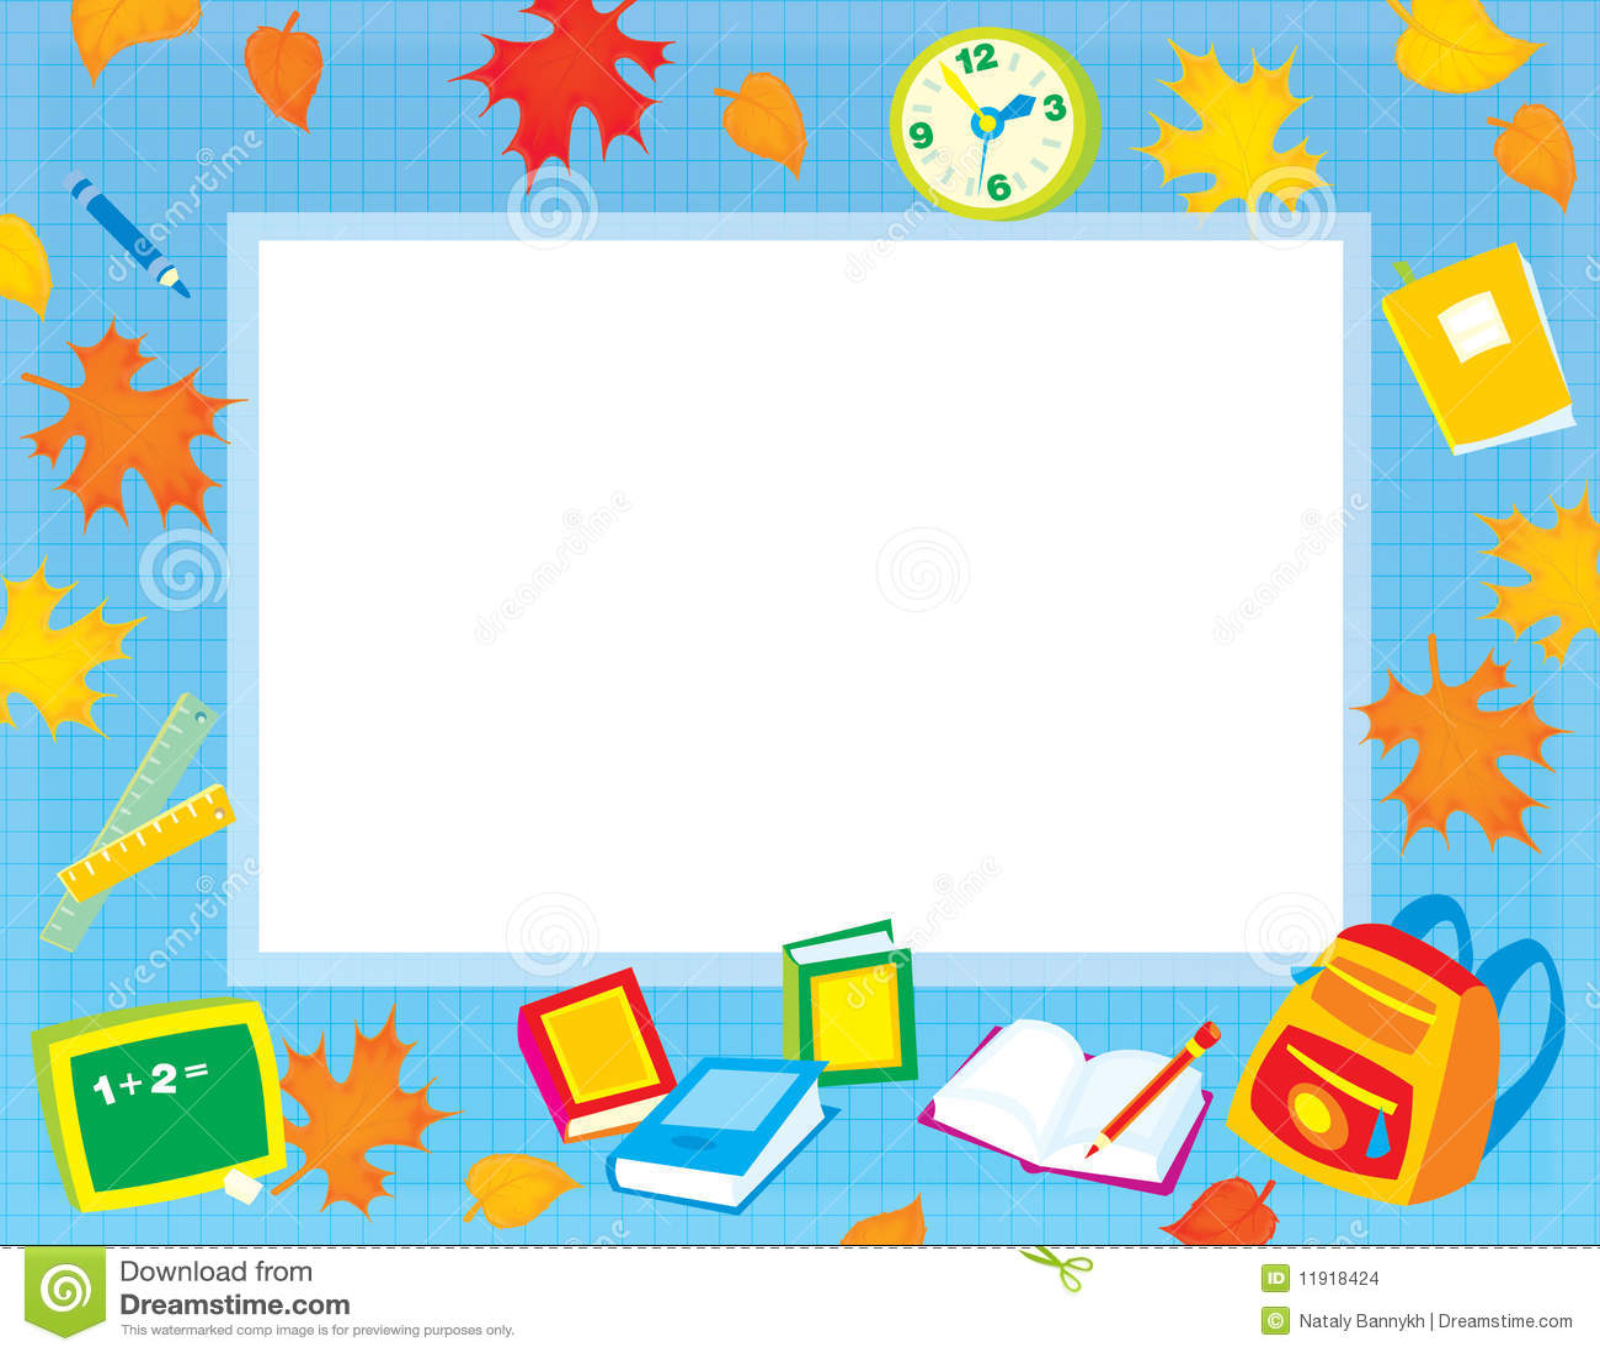 Stock Images School Border Your Photo Text Image11918424 on Preschool Graduation Letter To Children